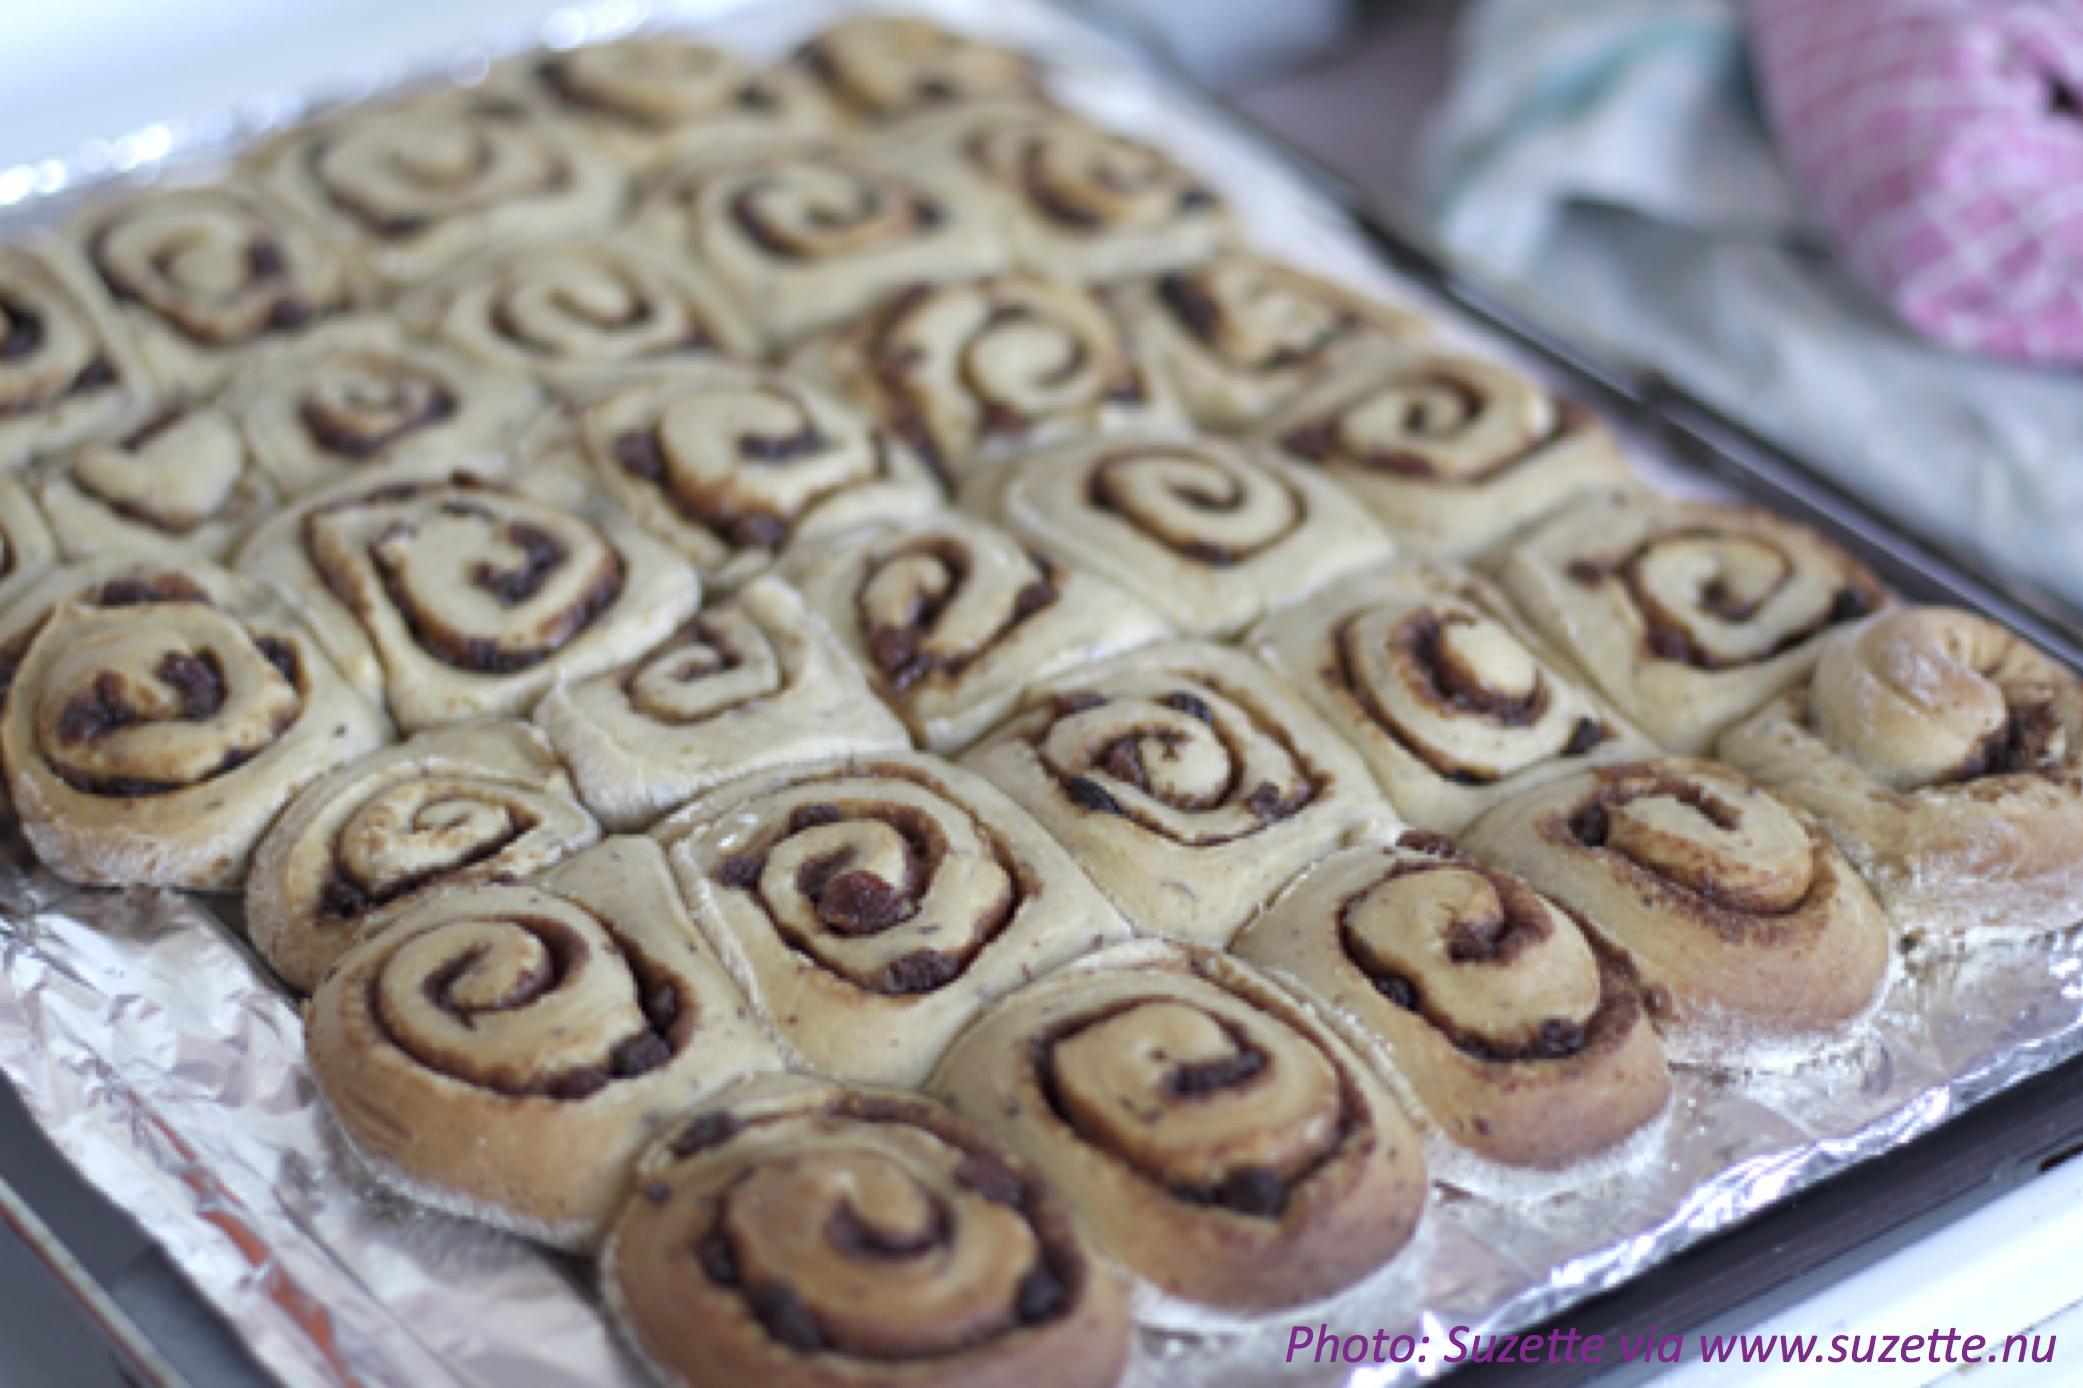 The Secret to Super-Fluffy Snacks